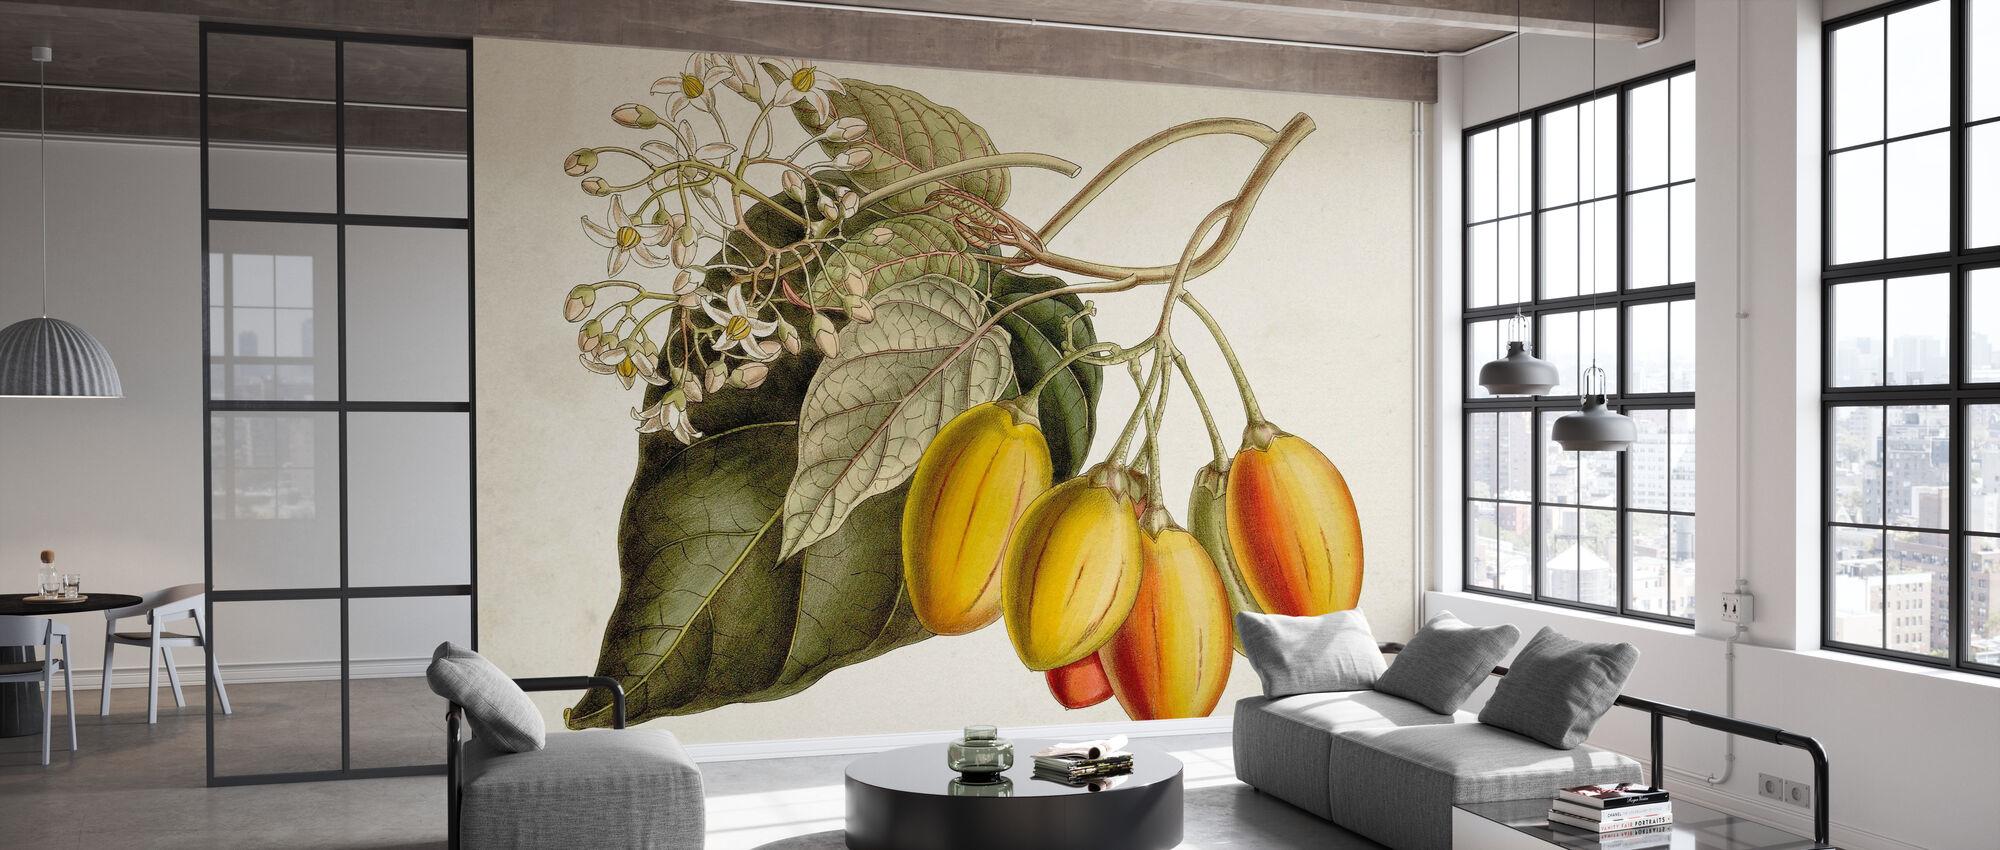 Tropische Laubfrucht III - Tapete - Büro